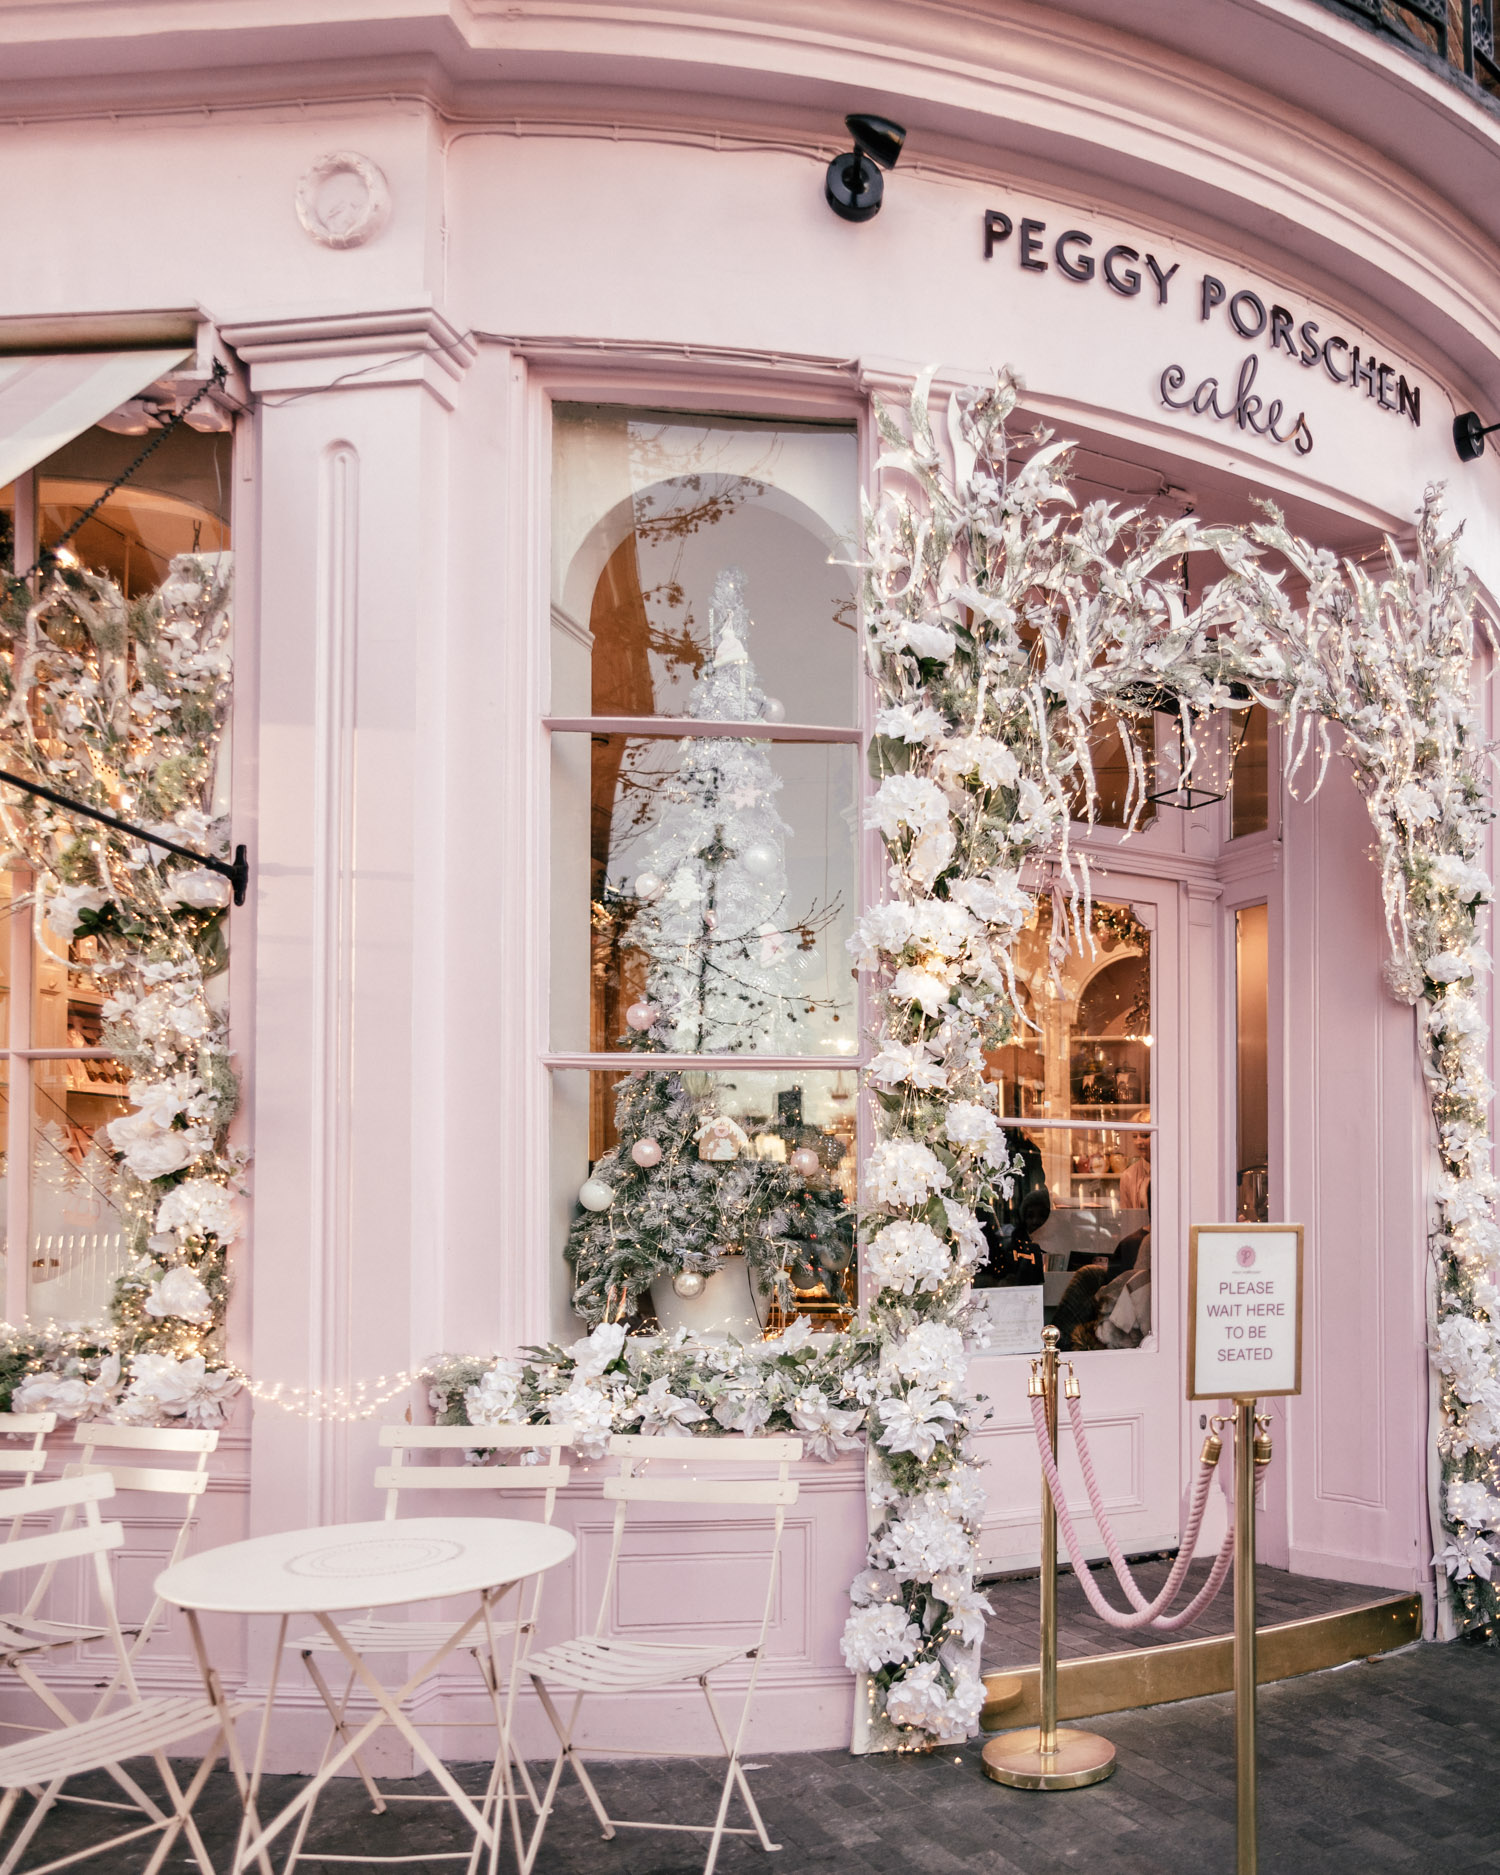 Peggy Porschen Cakes |Instagram-worthy spots in London